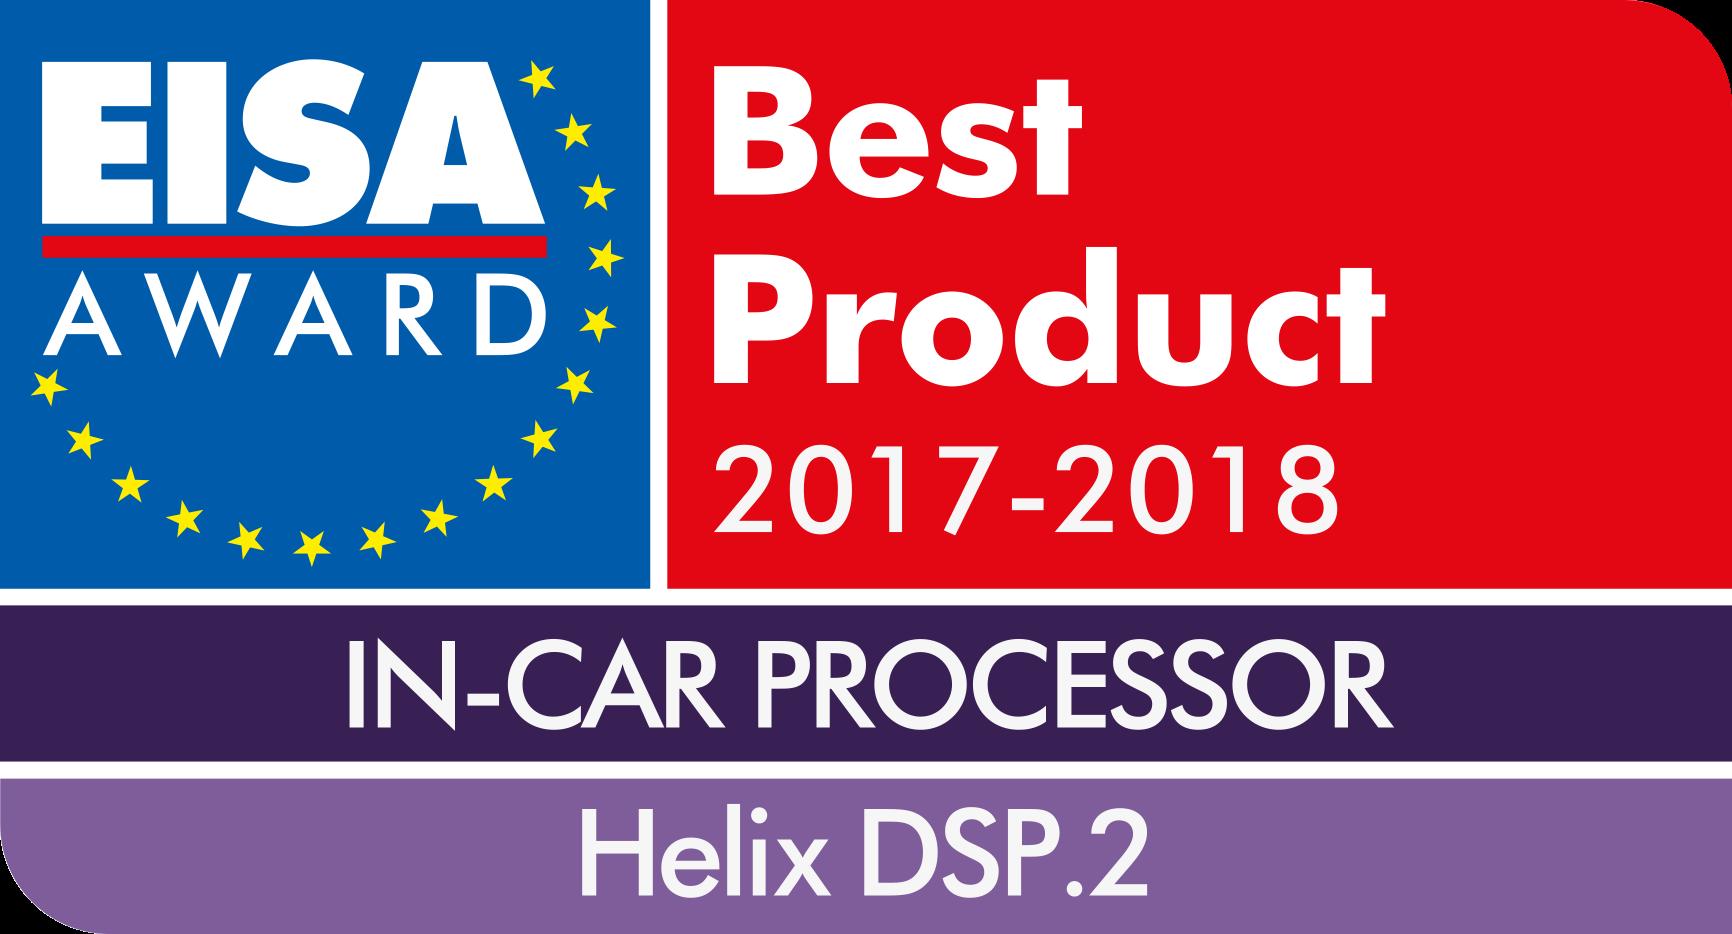 EISA-Award-Logo-Helix-DSP2